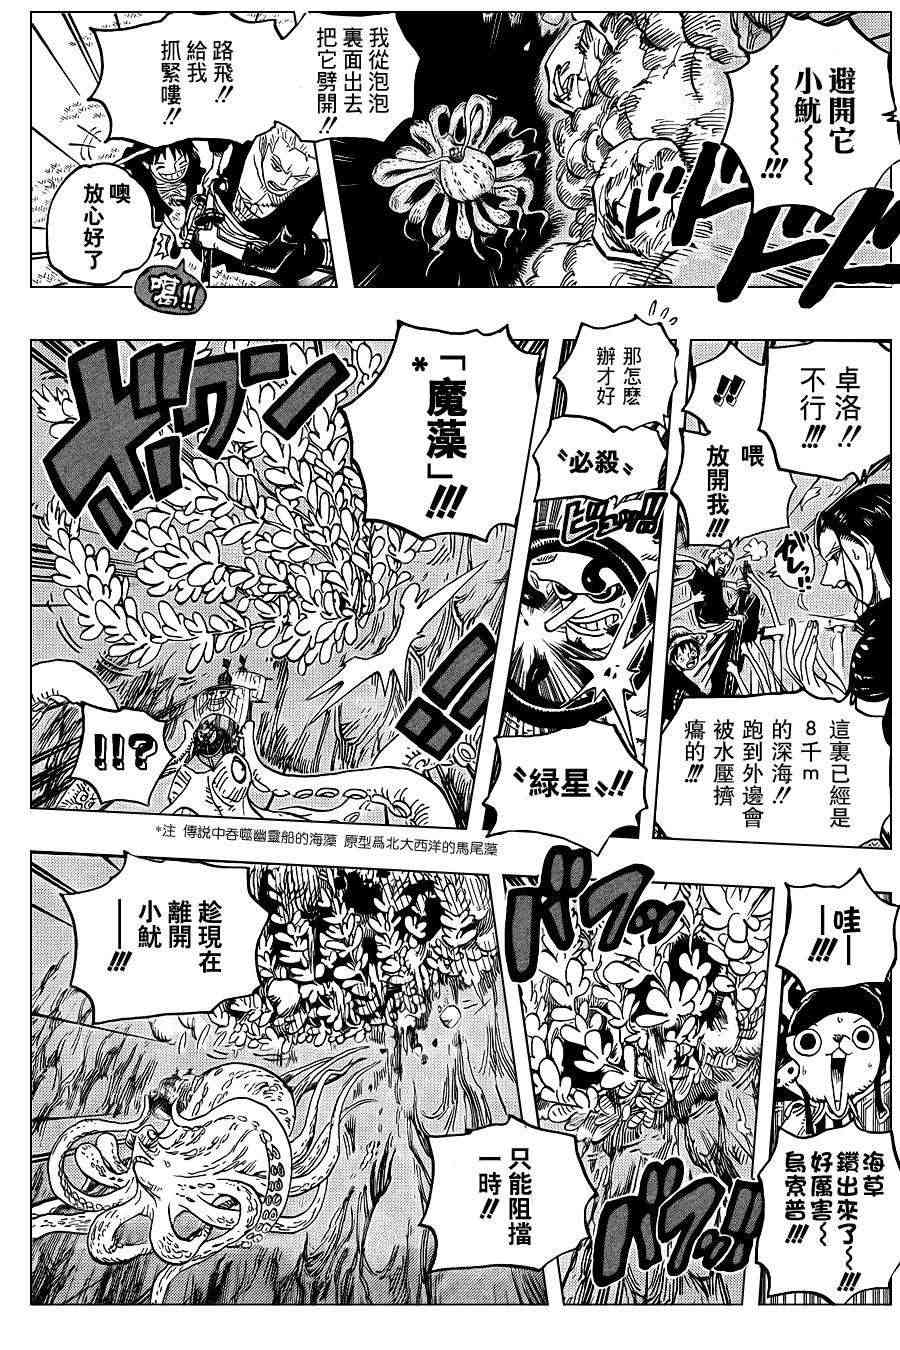 One Piece Manga 607 Spoiler Pics 0810